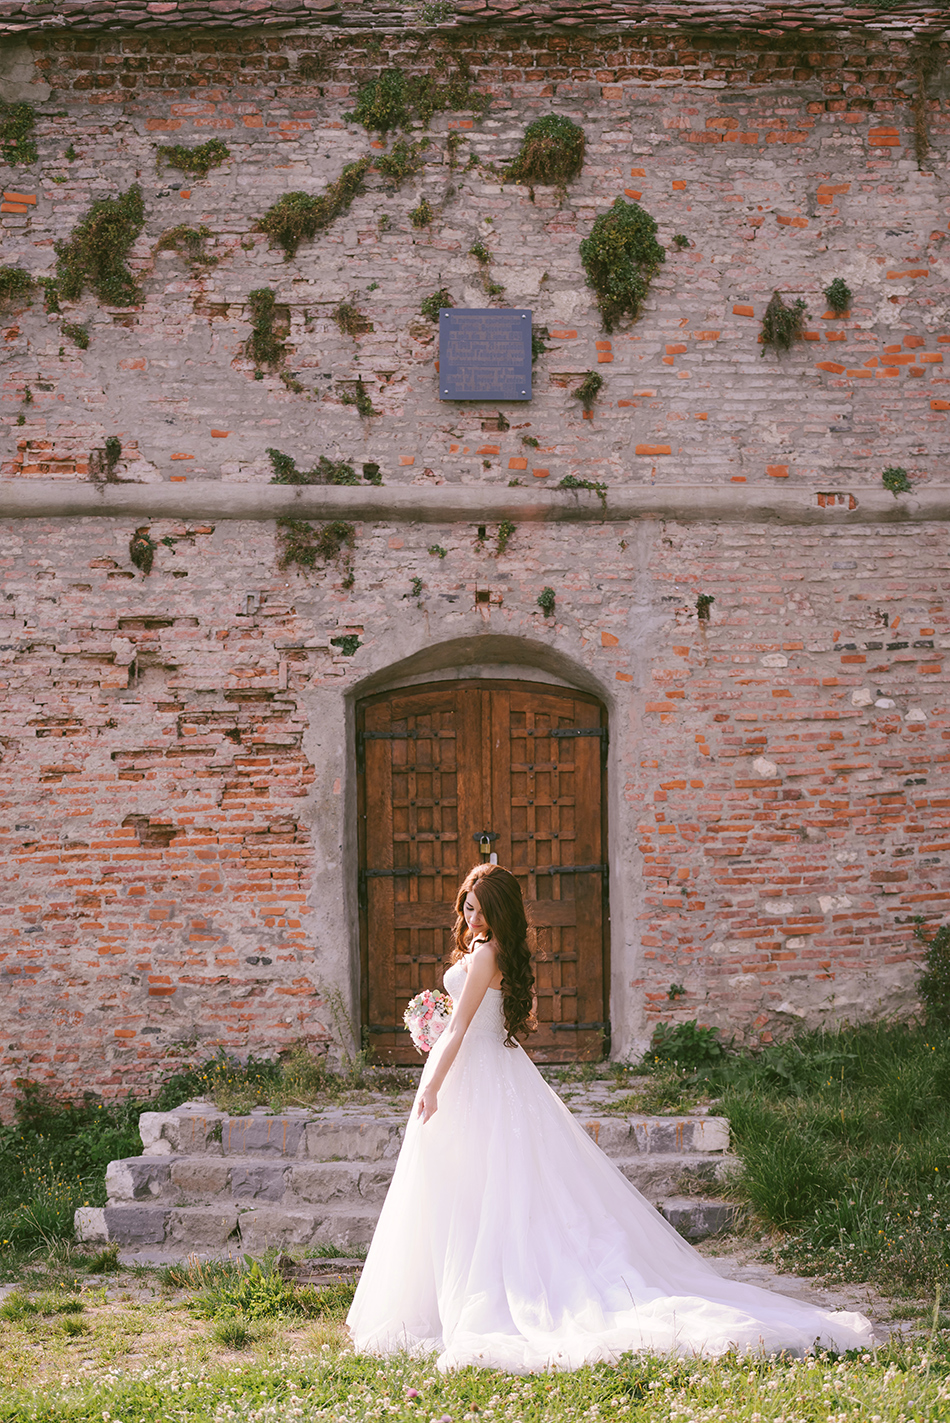 AD Passion Photography | fotograf-nunta-brasov-poiana-brasov-fotograf-profesionist_lorena-cristi_ttd_0001 | Adelin, Dida, fotograf profesionist, fotograf de nunta, fotografie de nunta, fotograf Timisoara, fotograf Craiova, fotograf Bucuresti, fotograf Arad, nunta Timisoara, nunta Arad, nunta Bucuresti, nunta Craiova